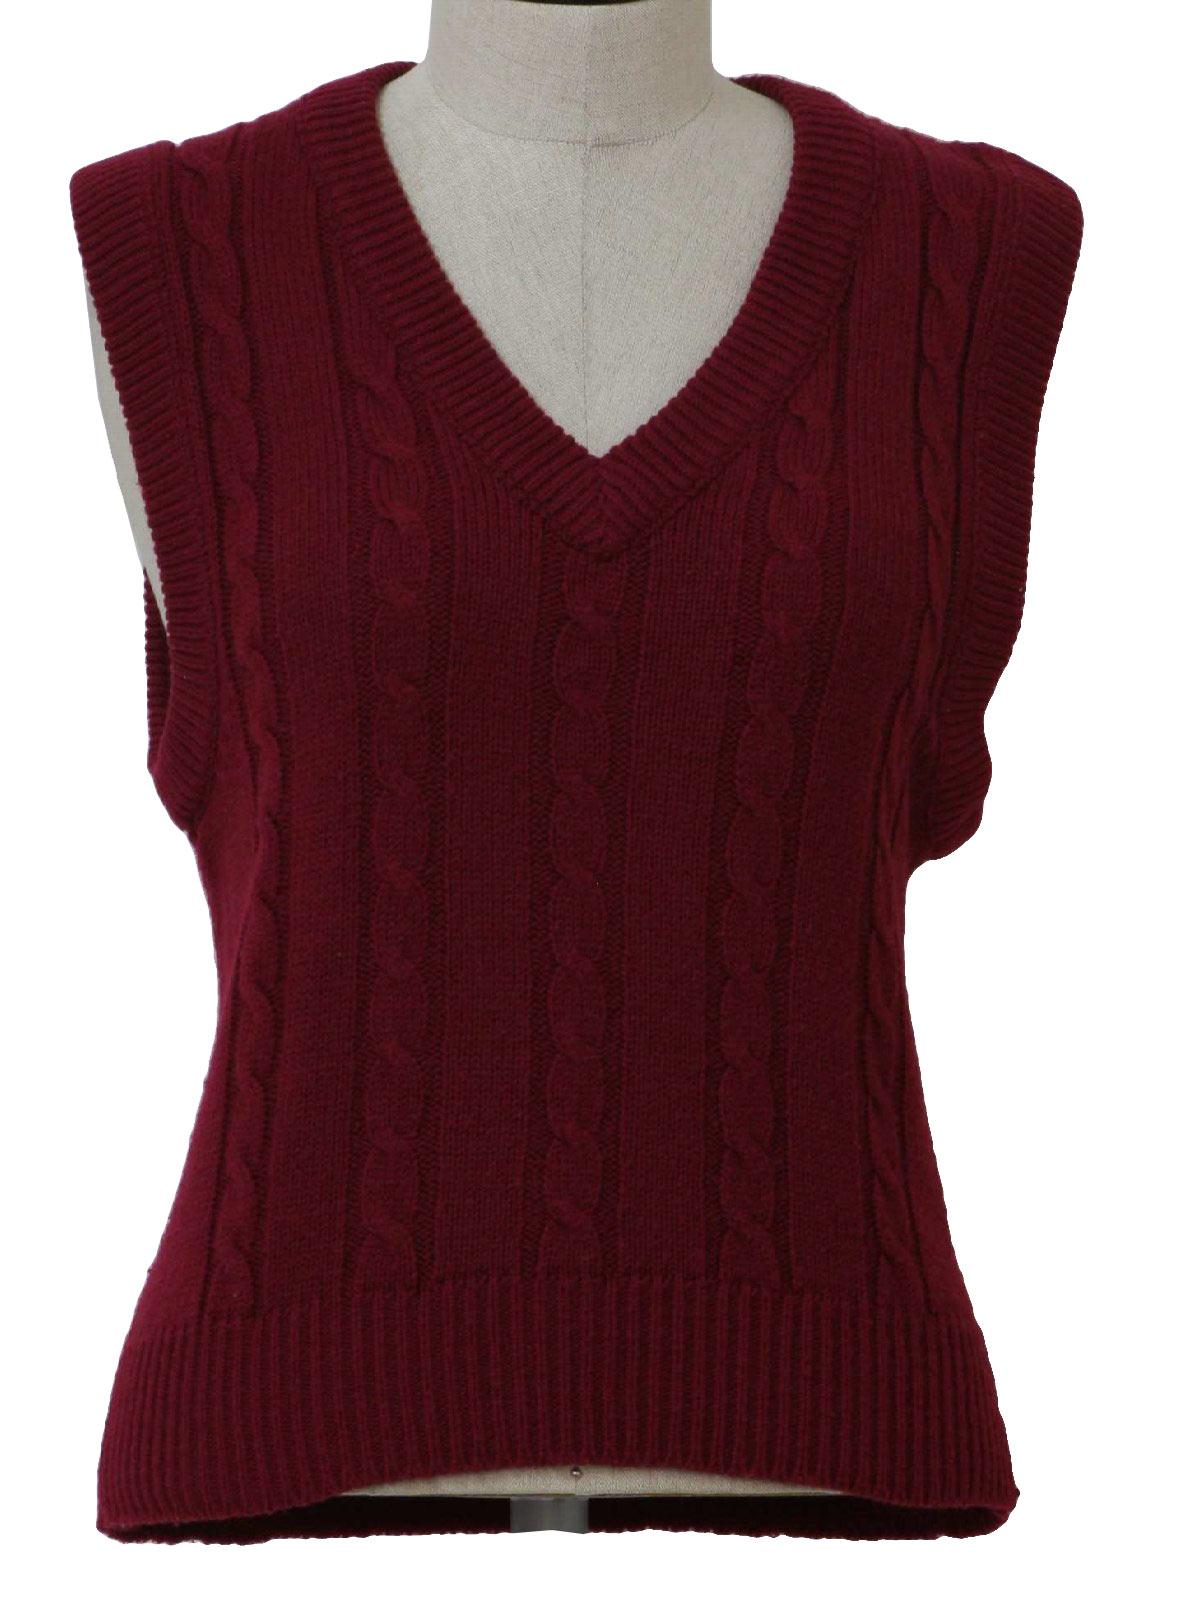 Patterns free women clothing vest pattern knitted patterns iran winter